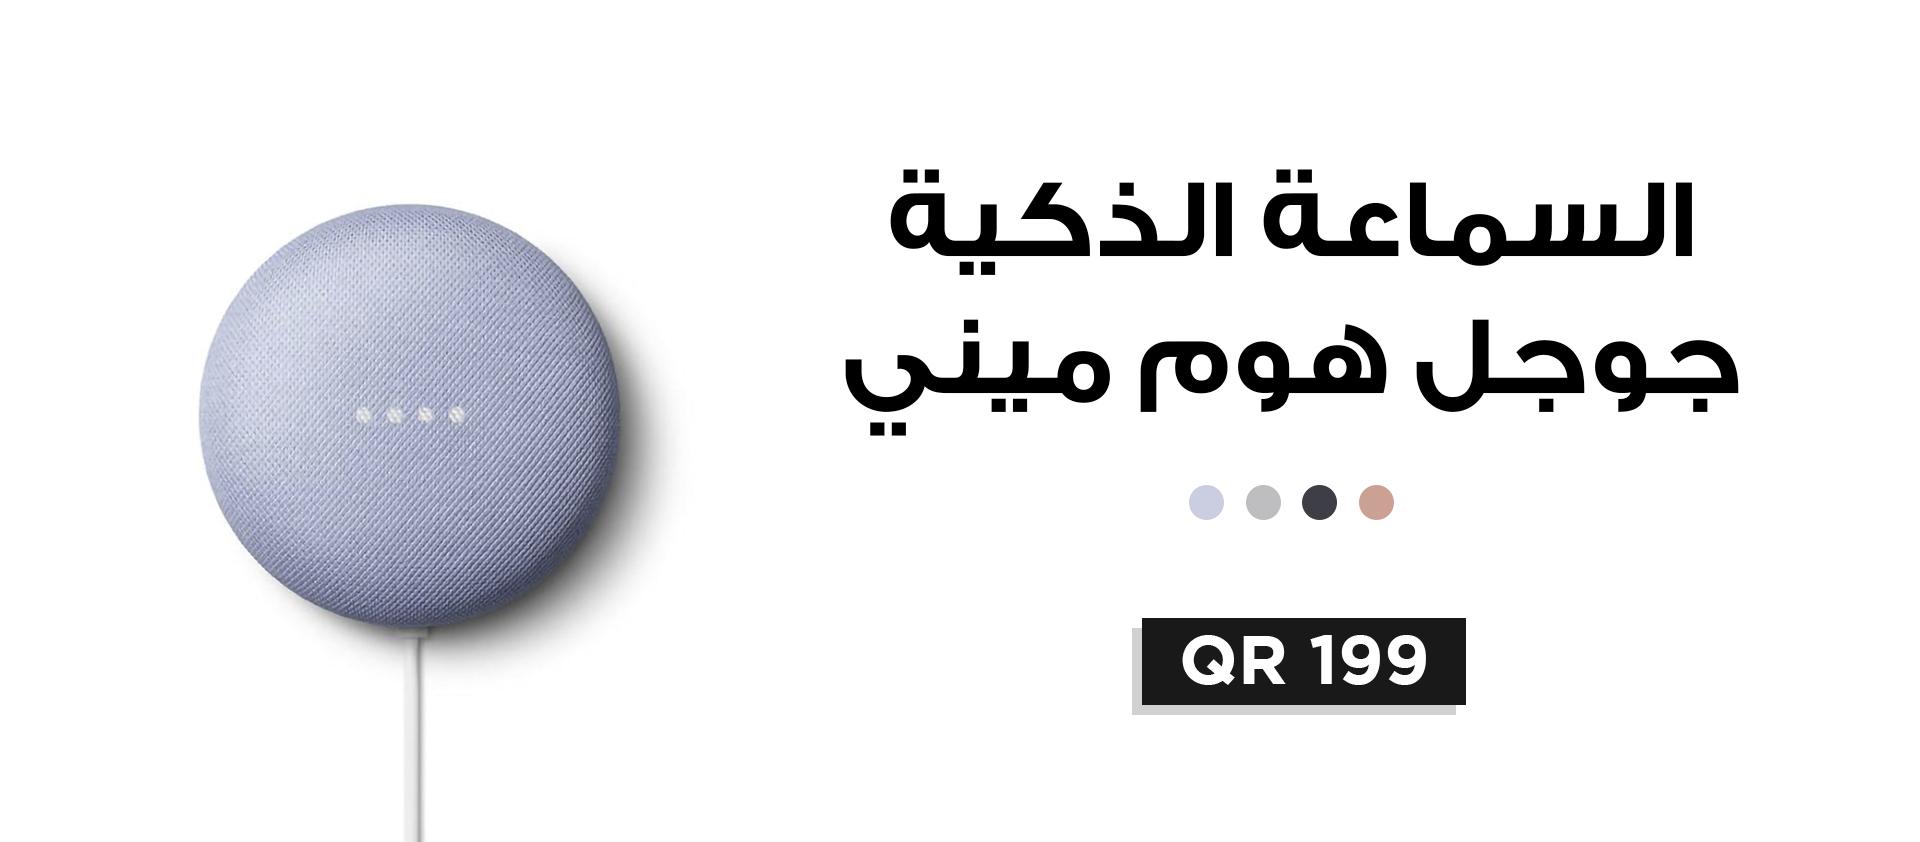 Google home mini for sale in Qatar